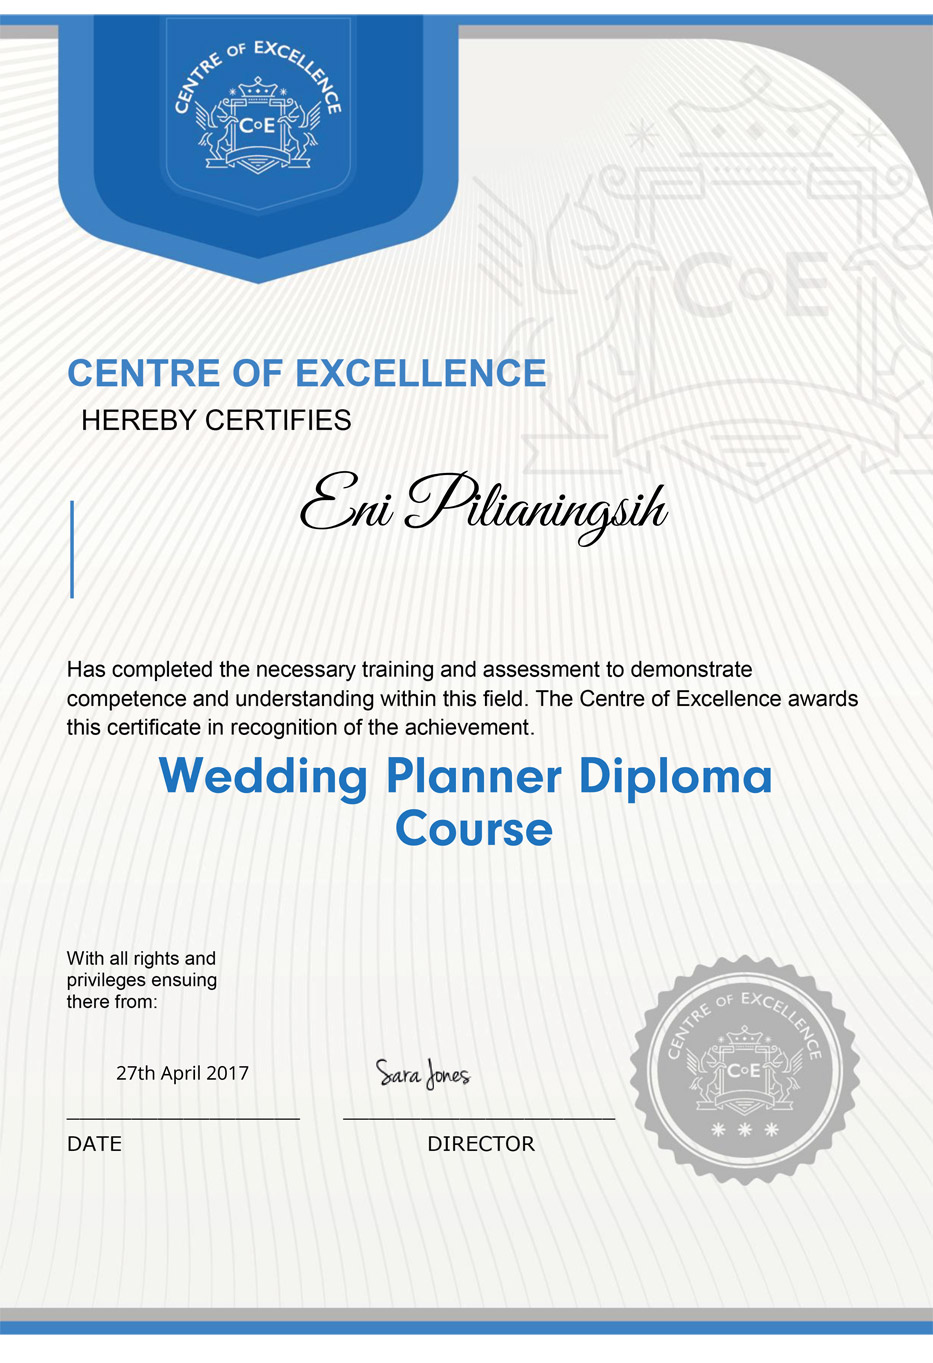 excellent awards for wedding planner